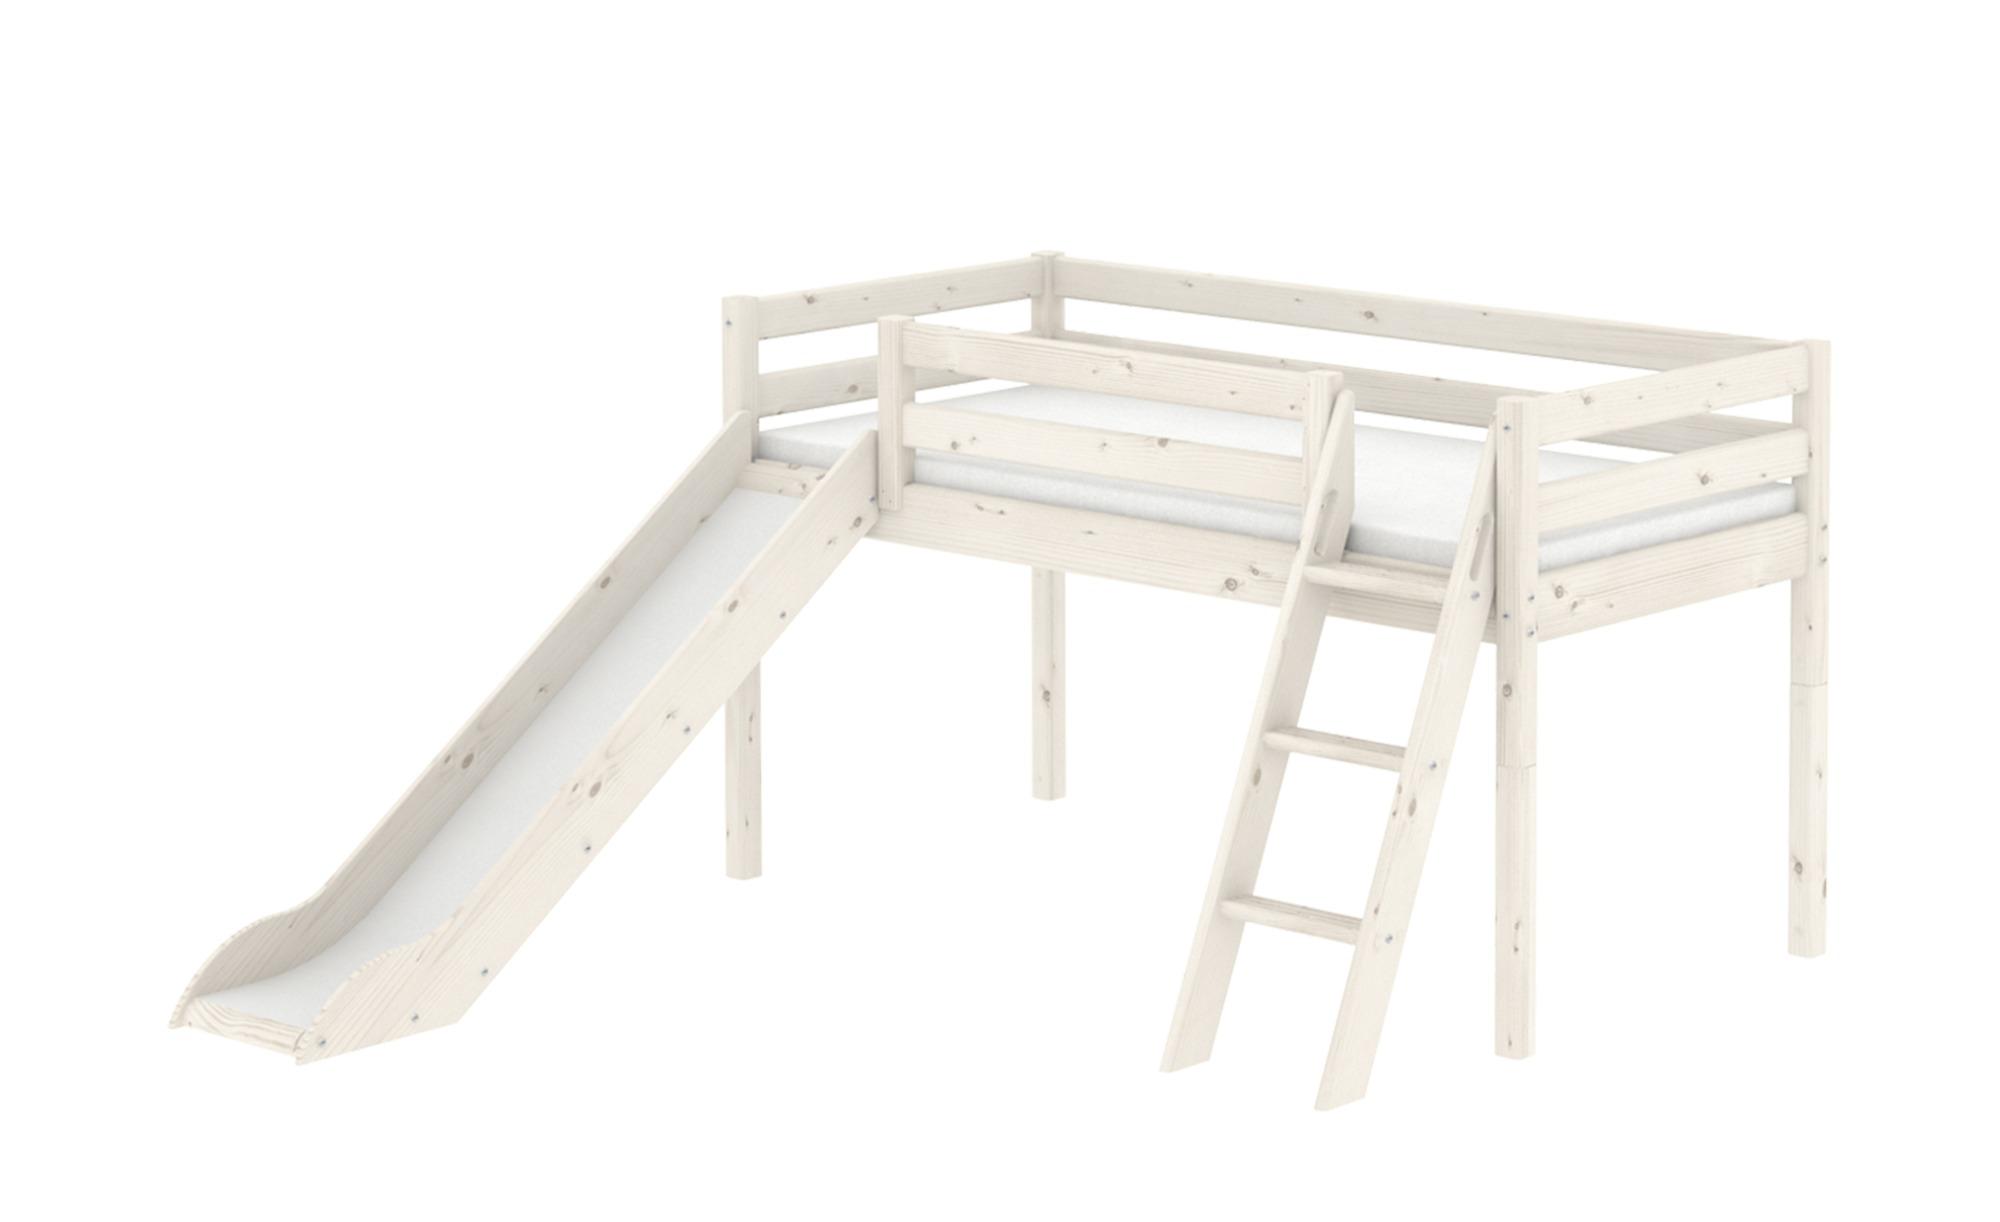 FLEXA Classic-Hochbett, halbhoch  Flexa - weiß - 249 cm - 120 cm - Jugendmöbel > Jugendbetten - Möbel Kraft